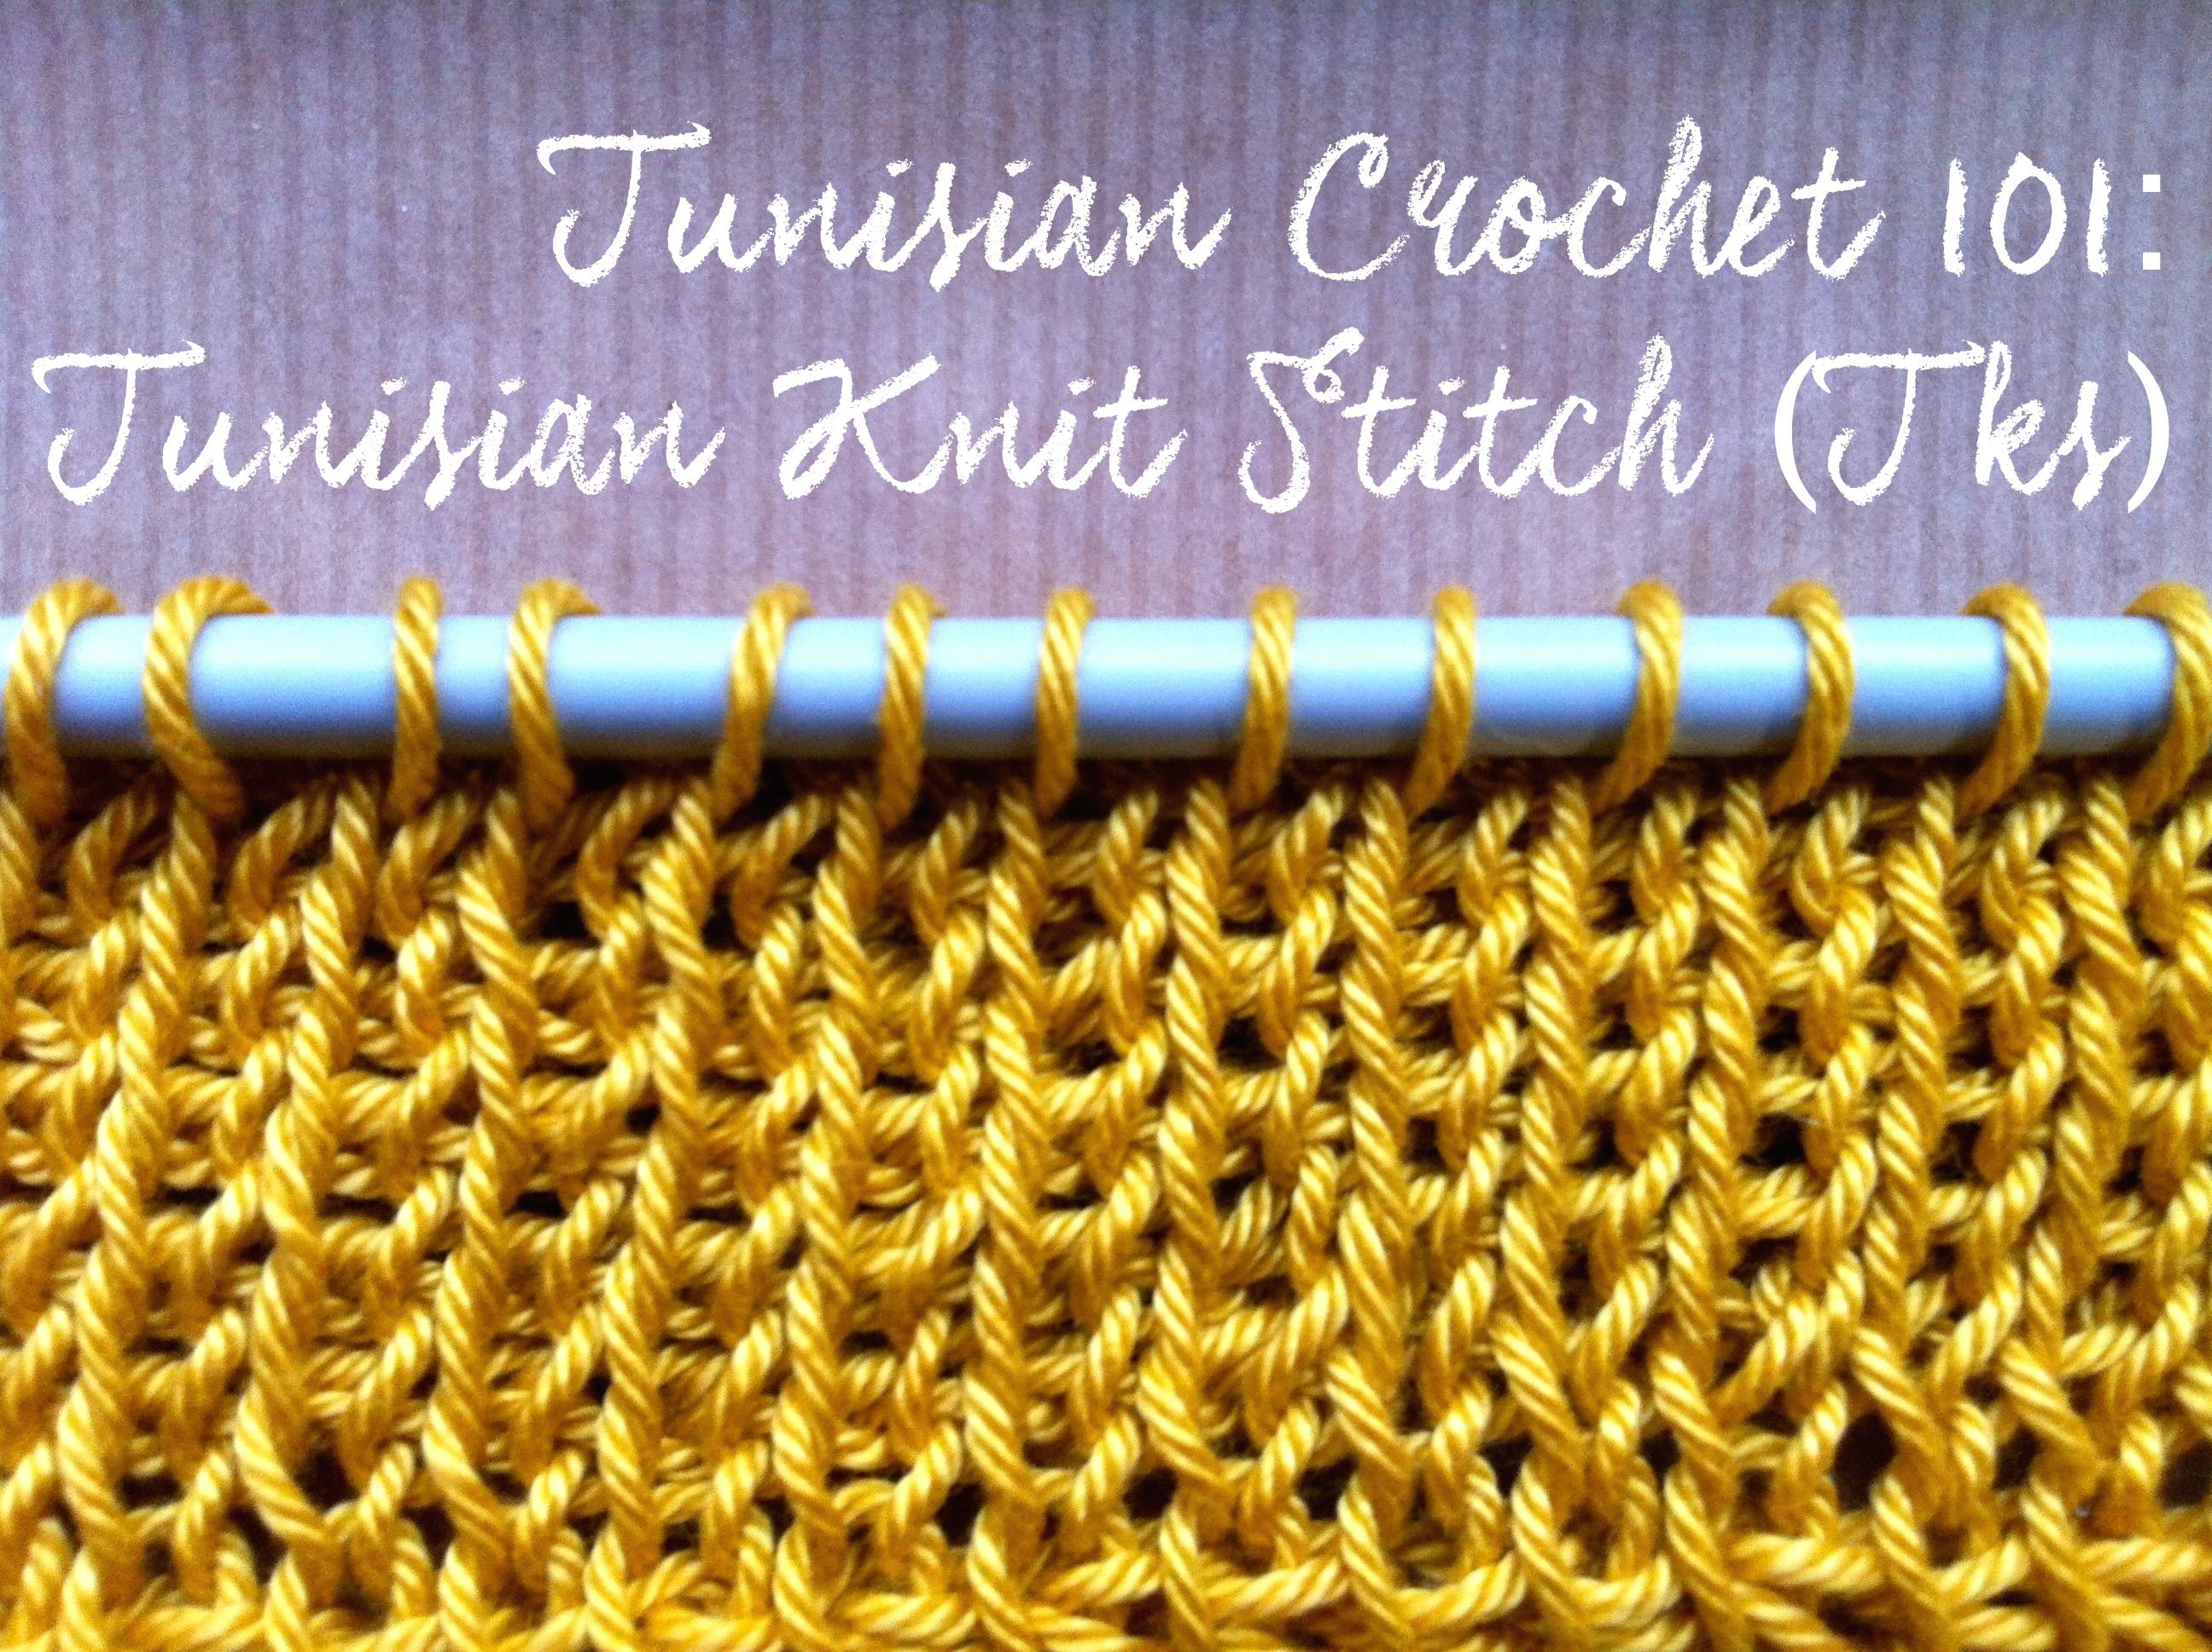 Tunisian Crochet 101: Tunisian Knit Stitch (Tks) | a crochet journey